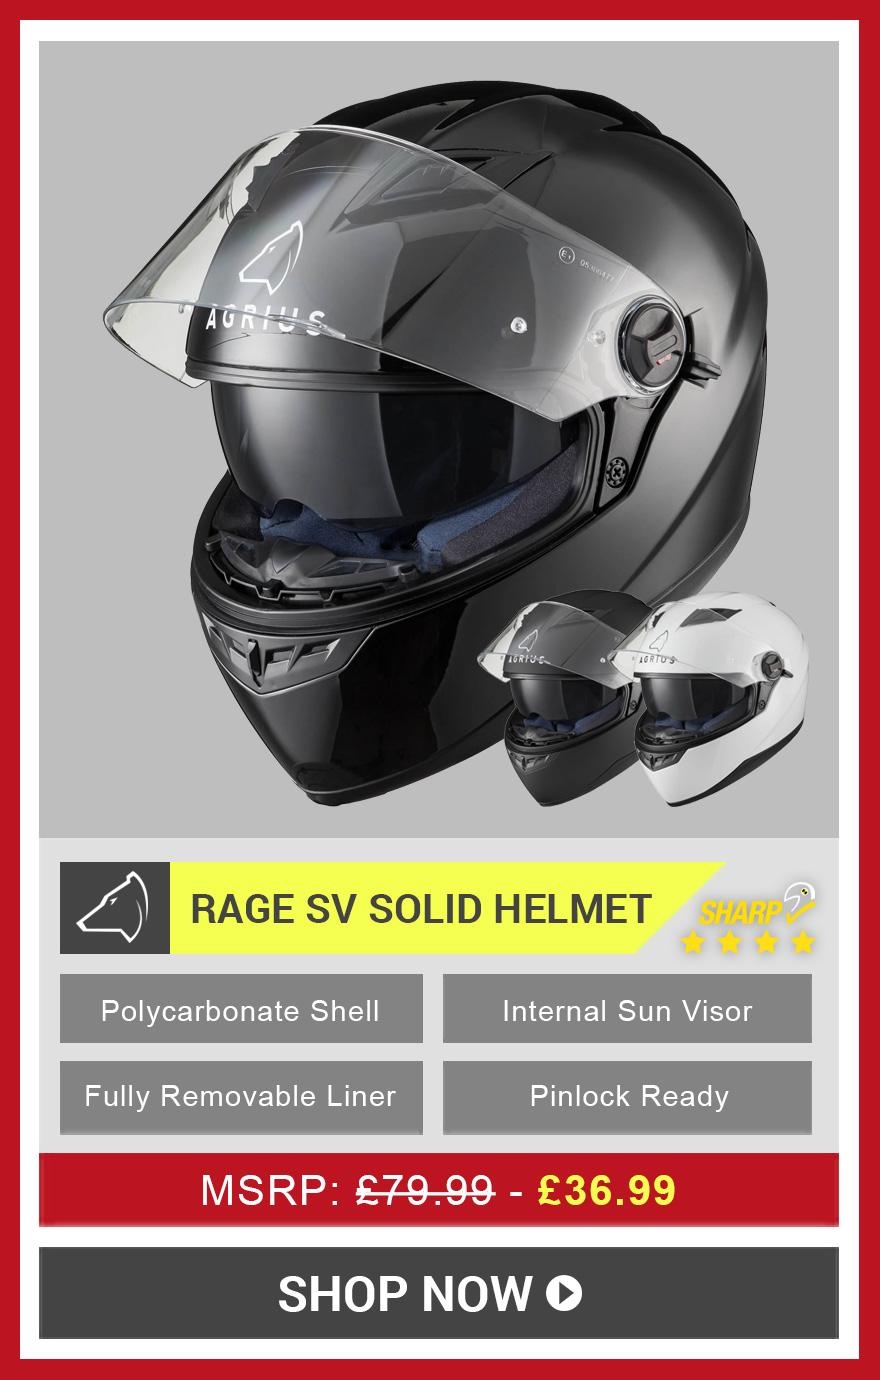 Rage SV Helmet